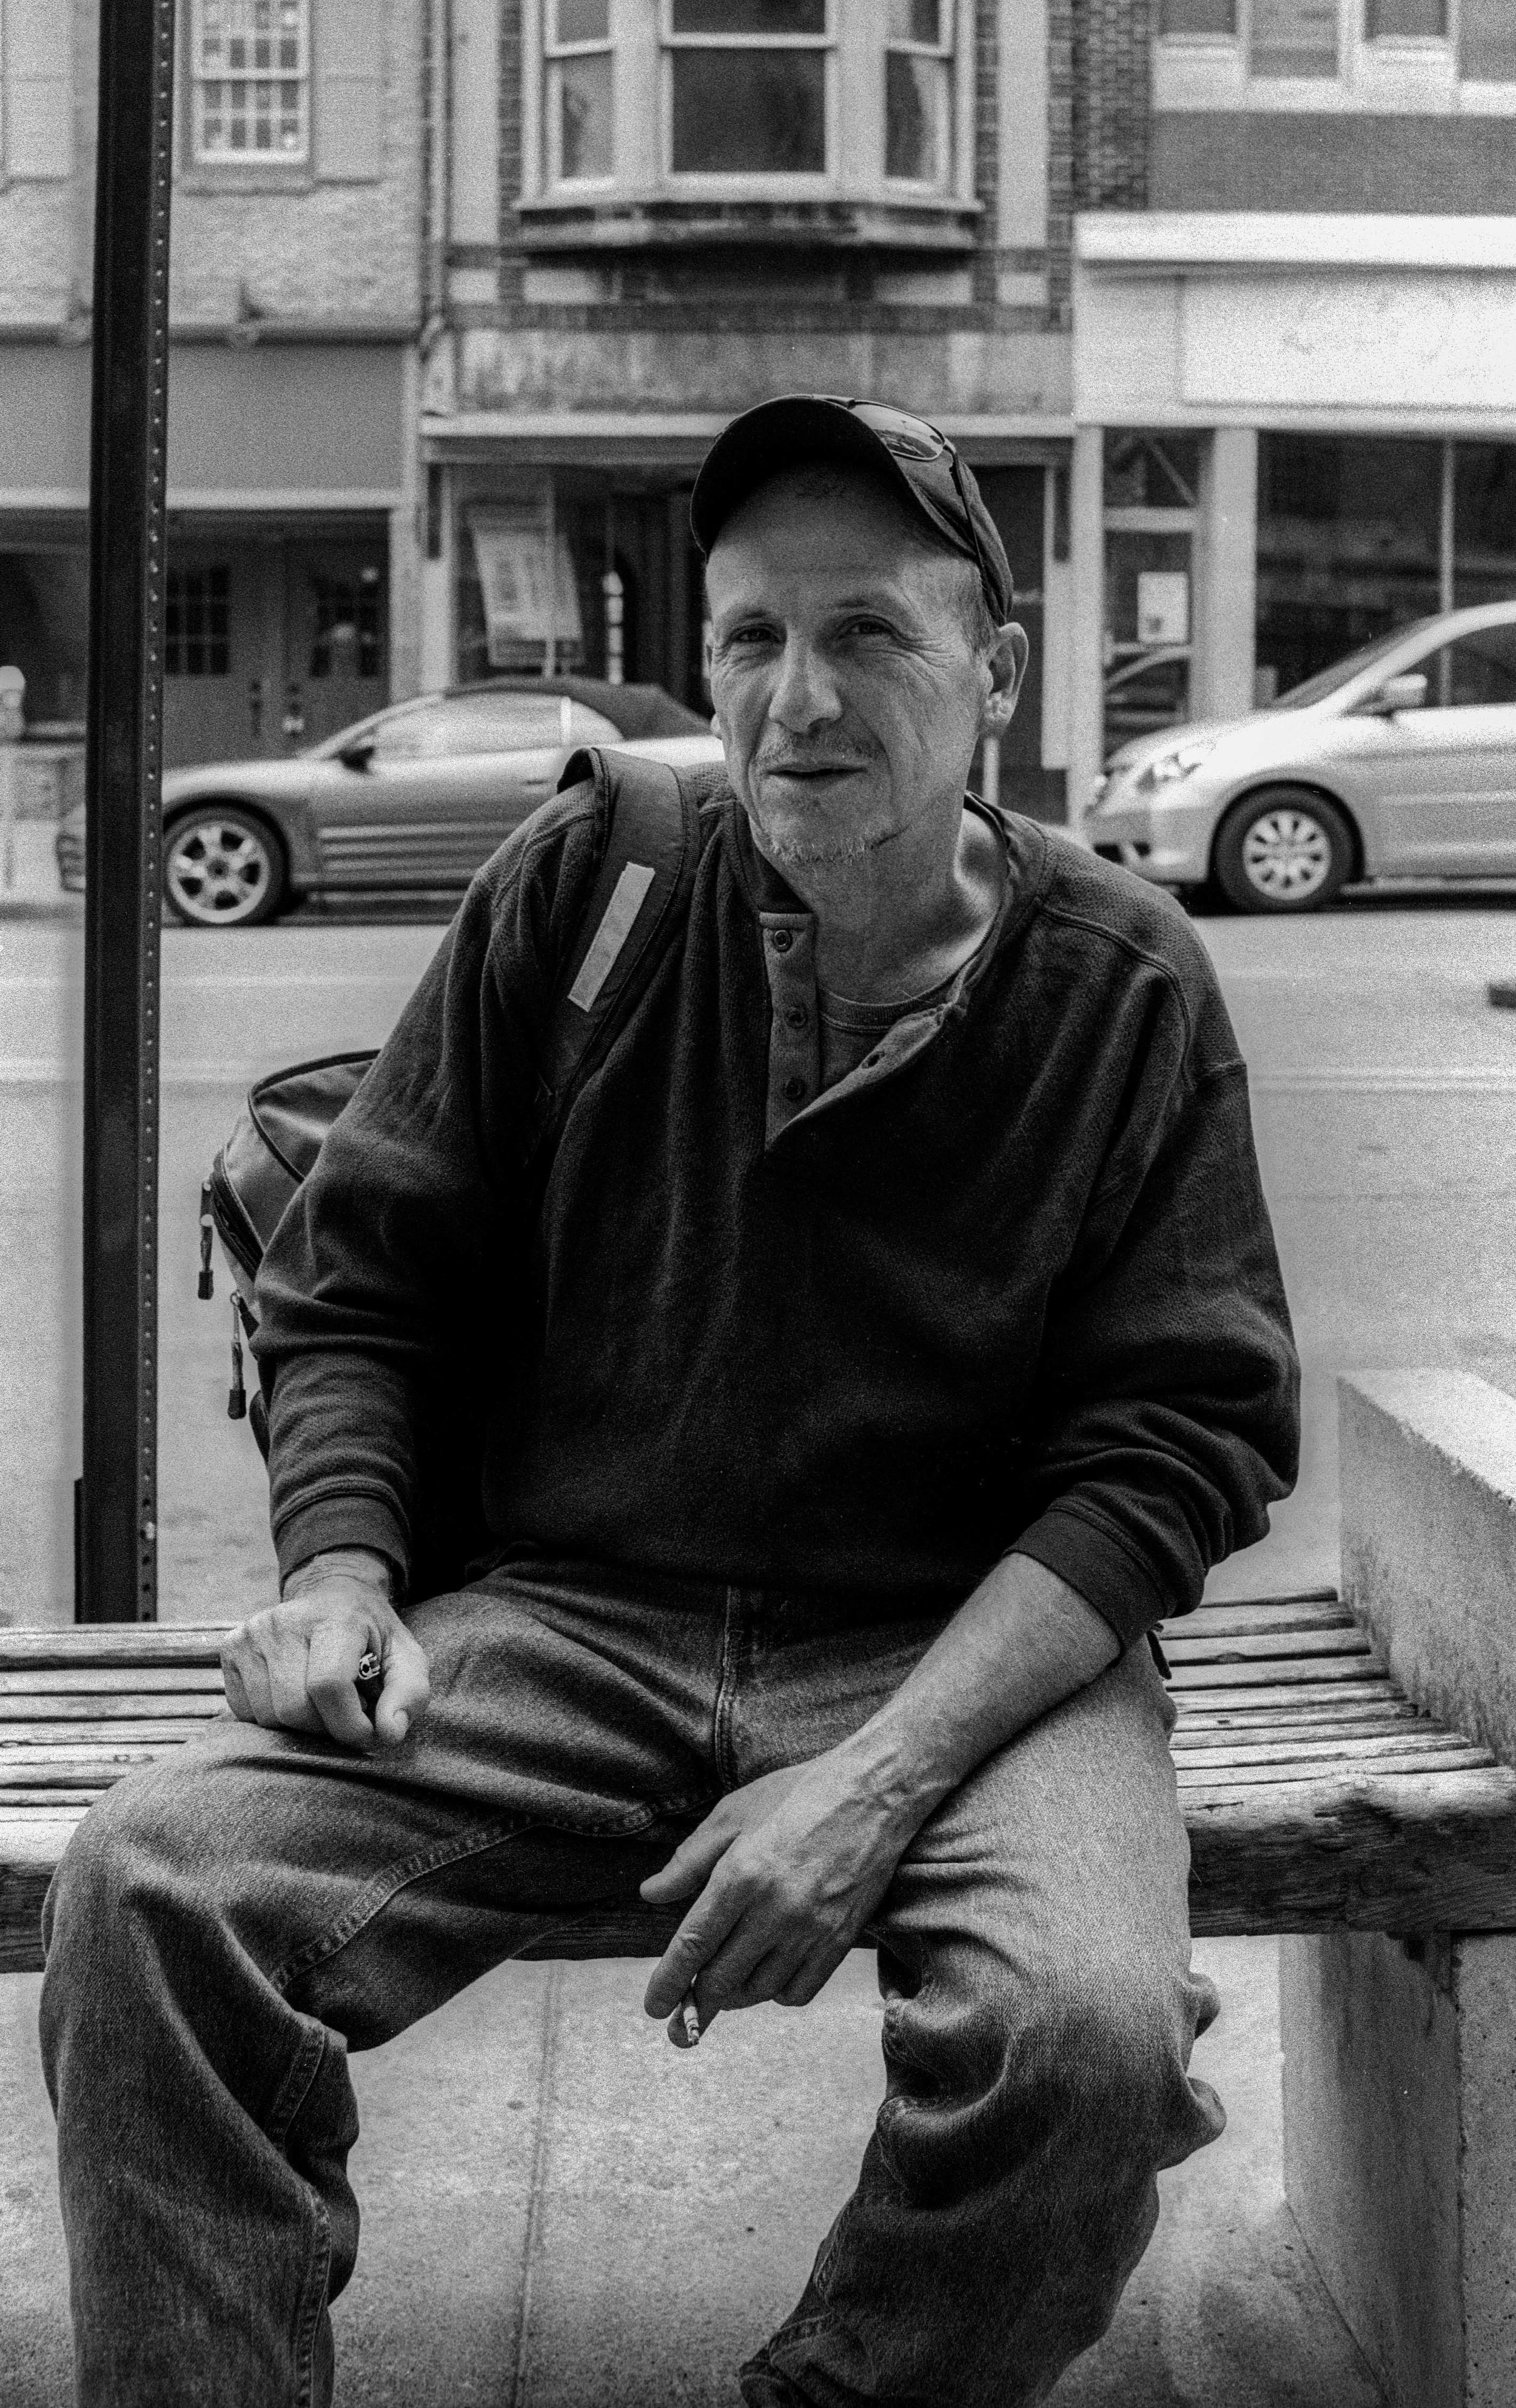 Cigarette Break, Allentown - 2014